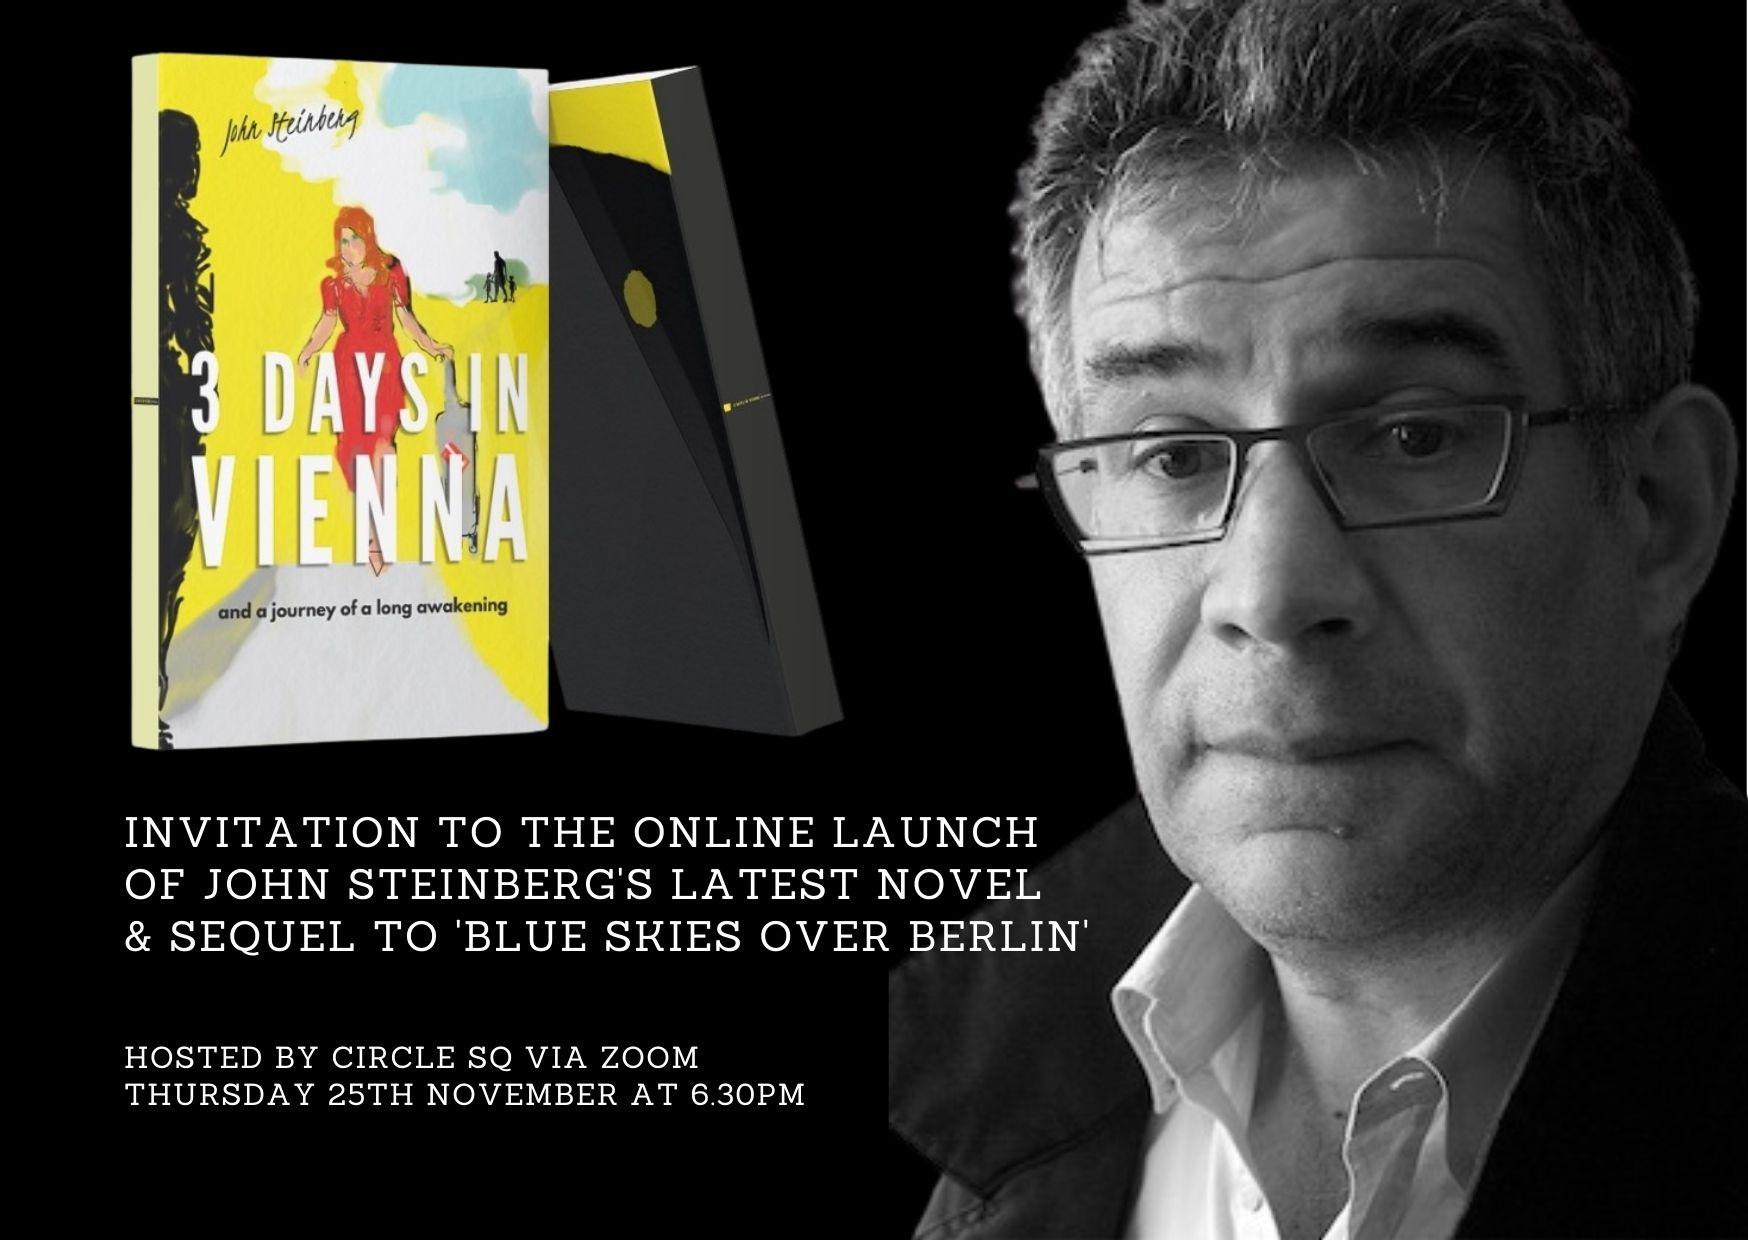 3 Days - launch invite